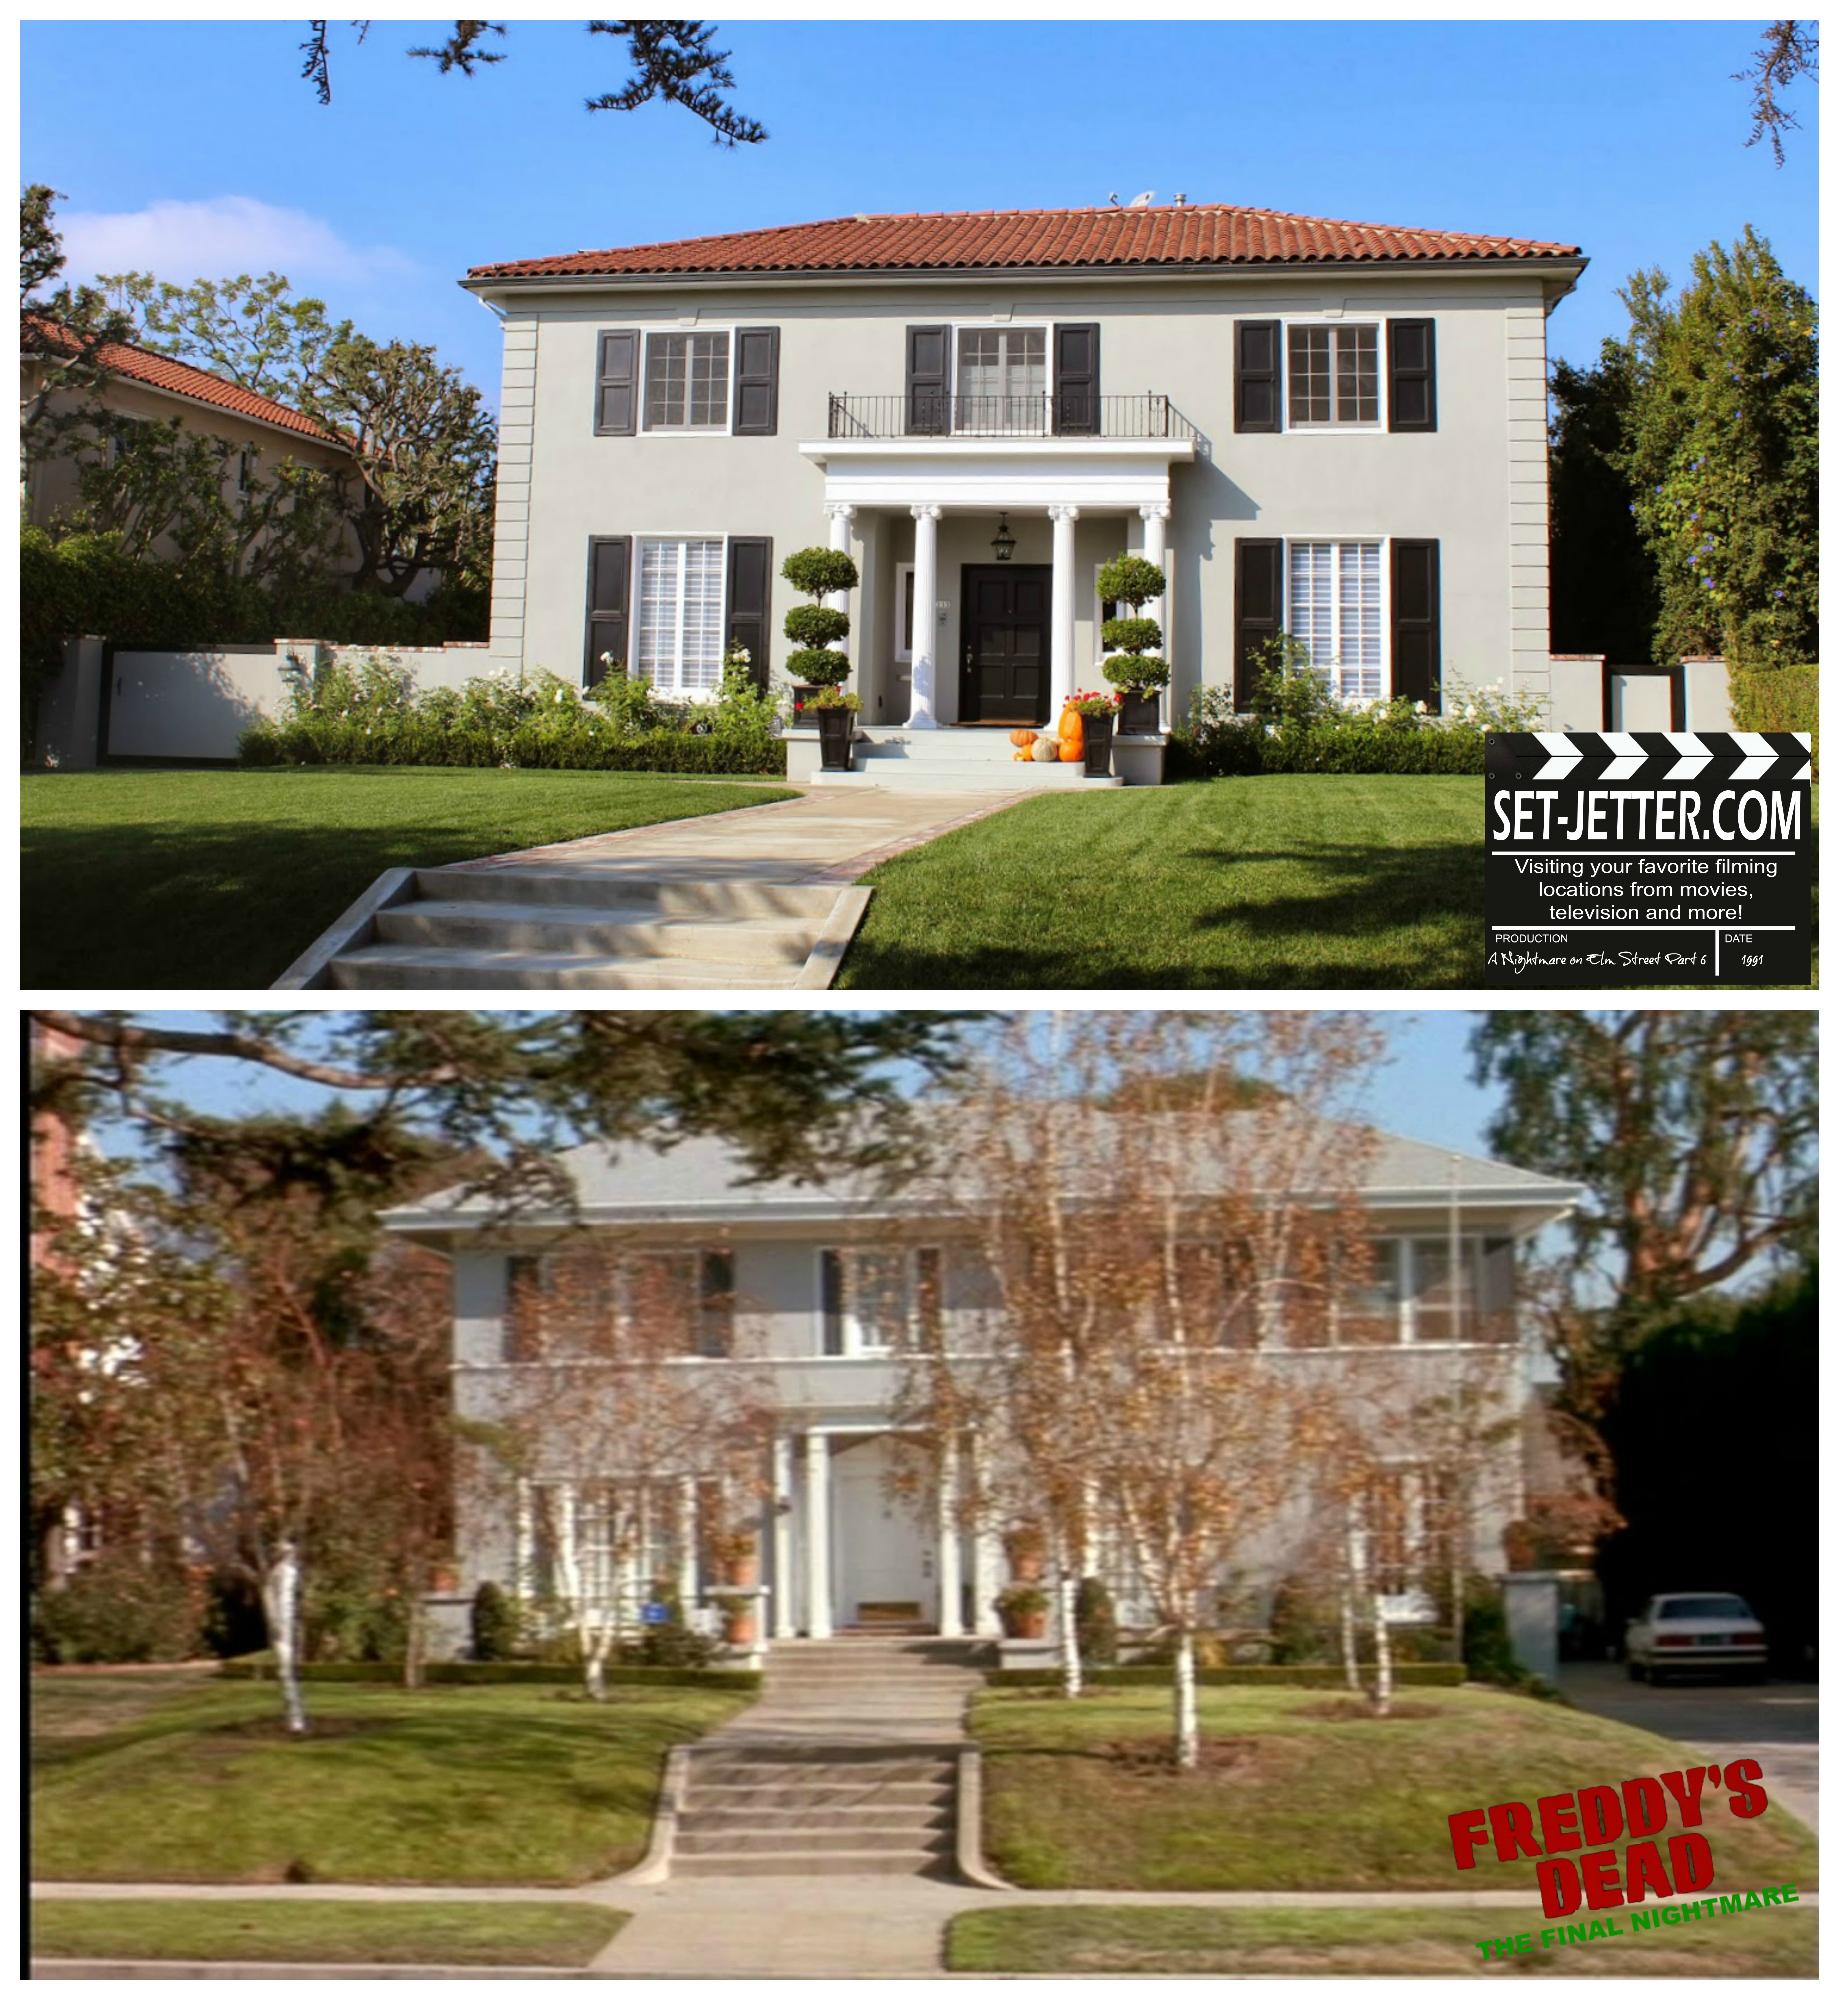 Nightmare on Elm Street Part 6 comparison 13.jpg